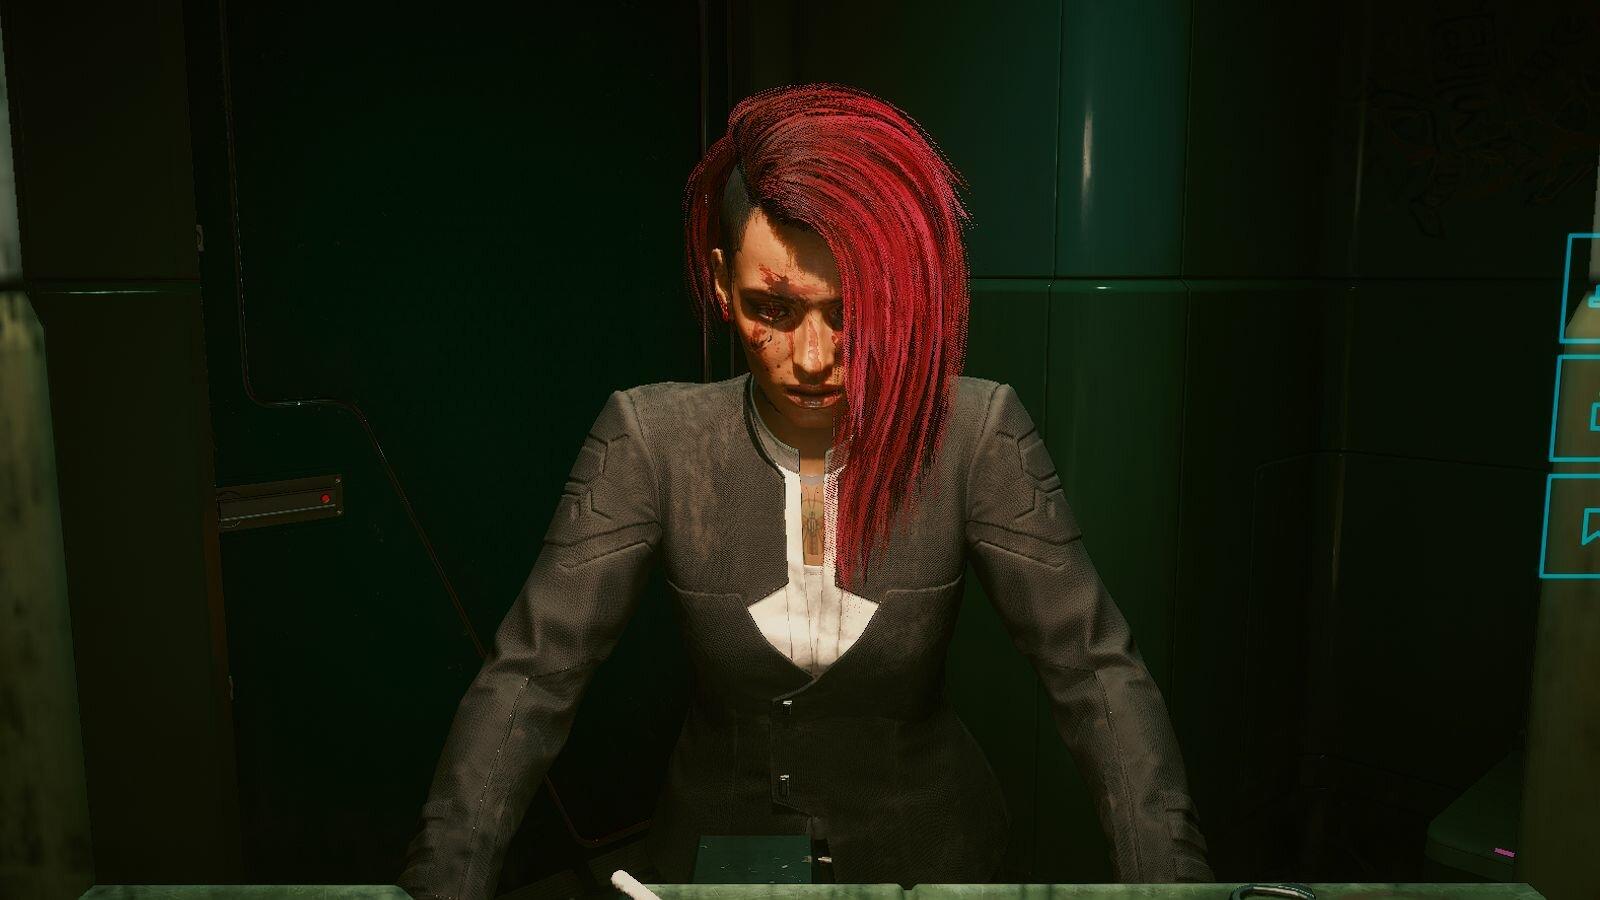 Трудный день.. Cyberpunk 2077